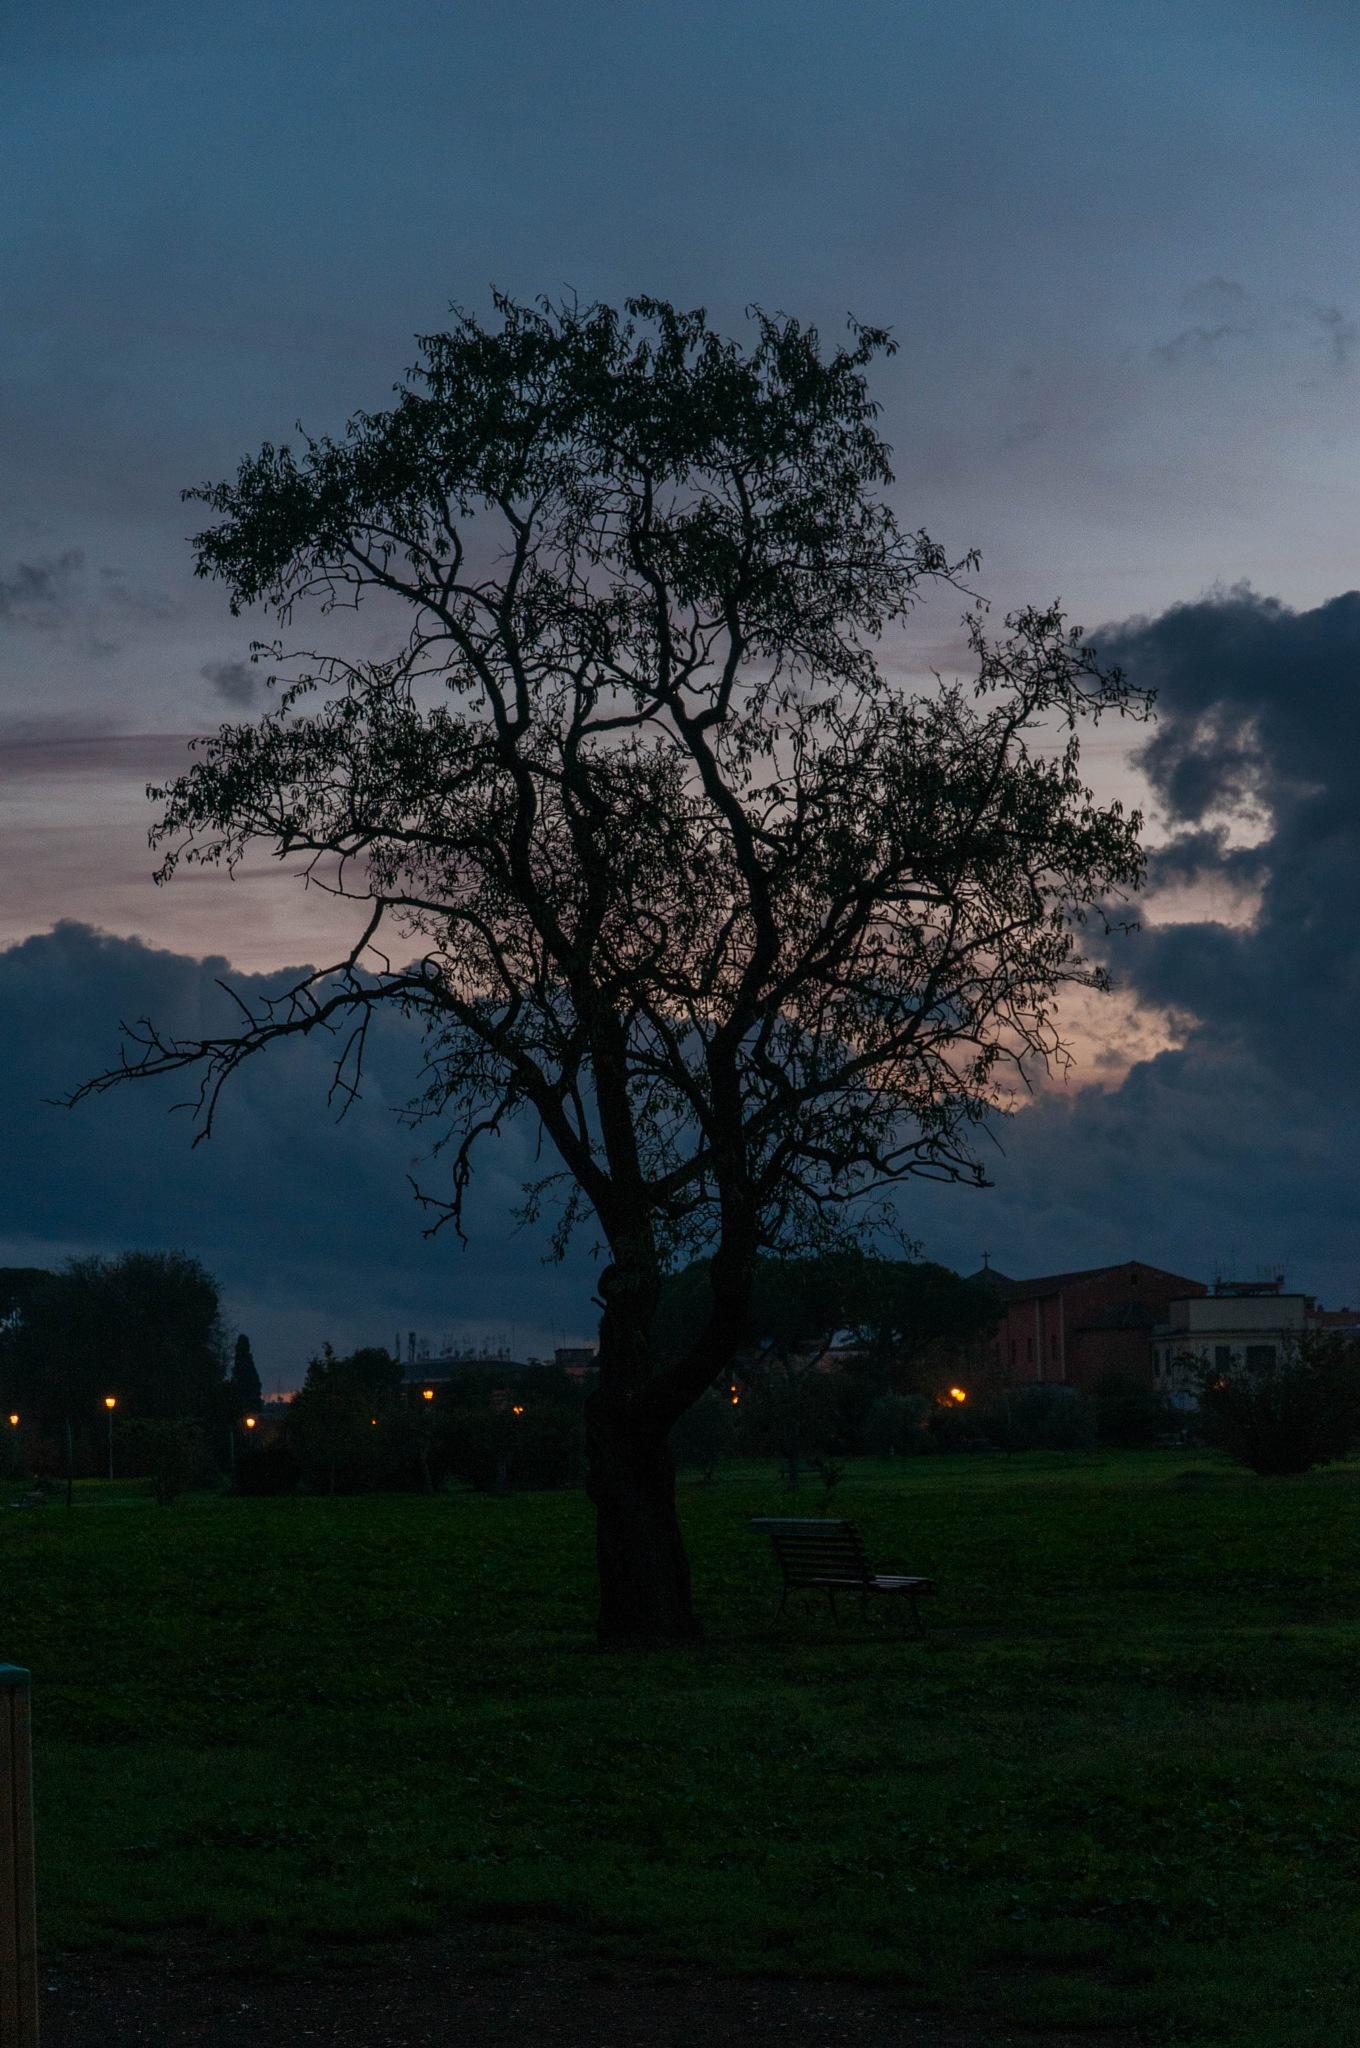 Untitled by Livio Seri